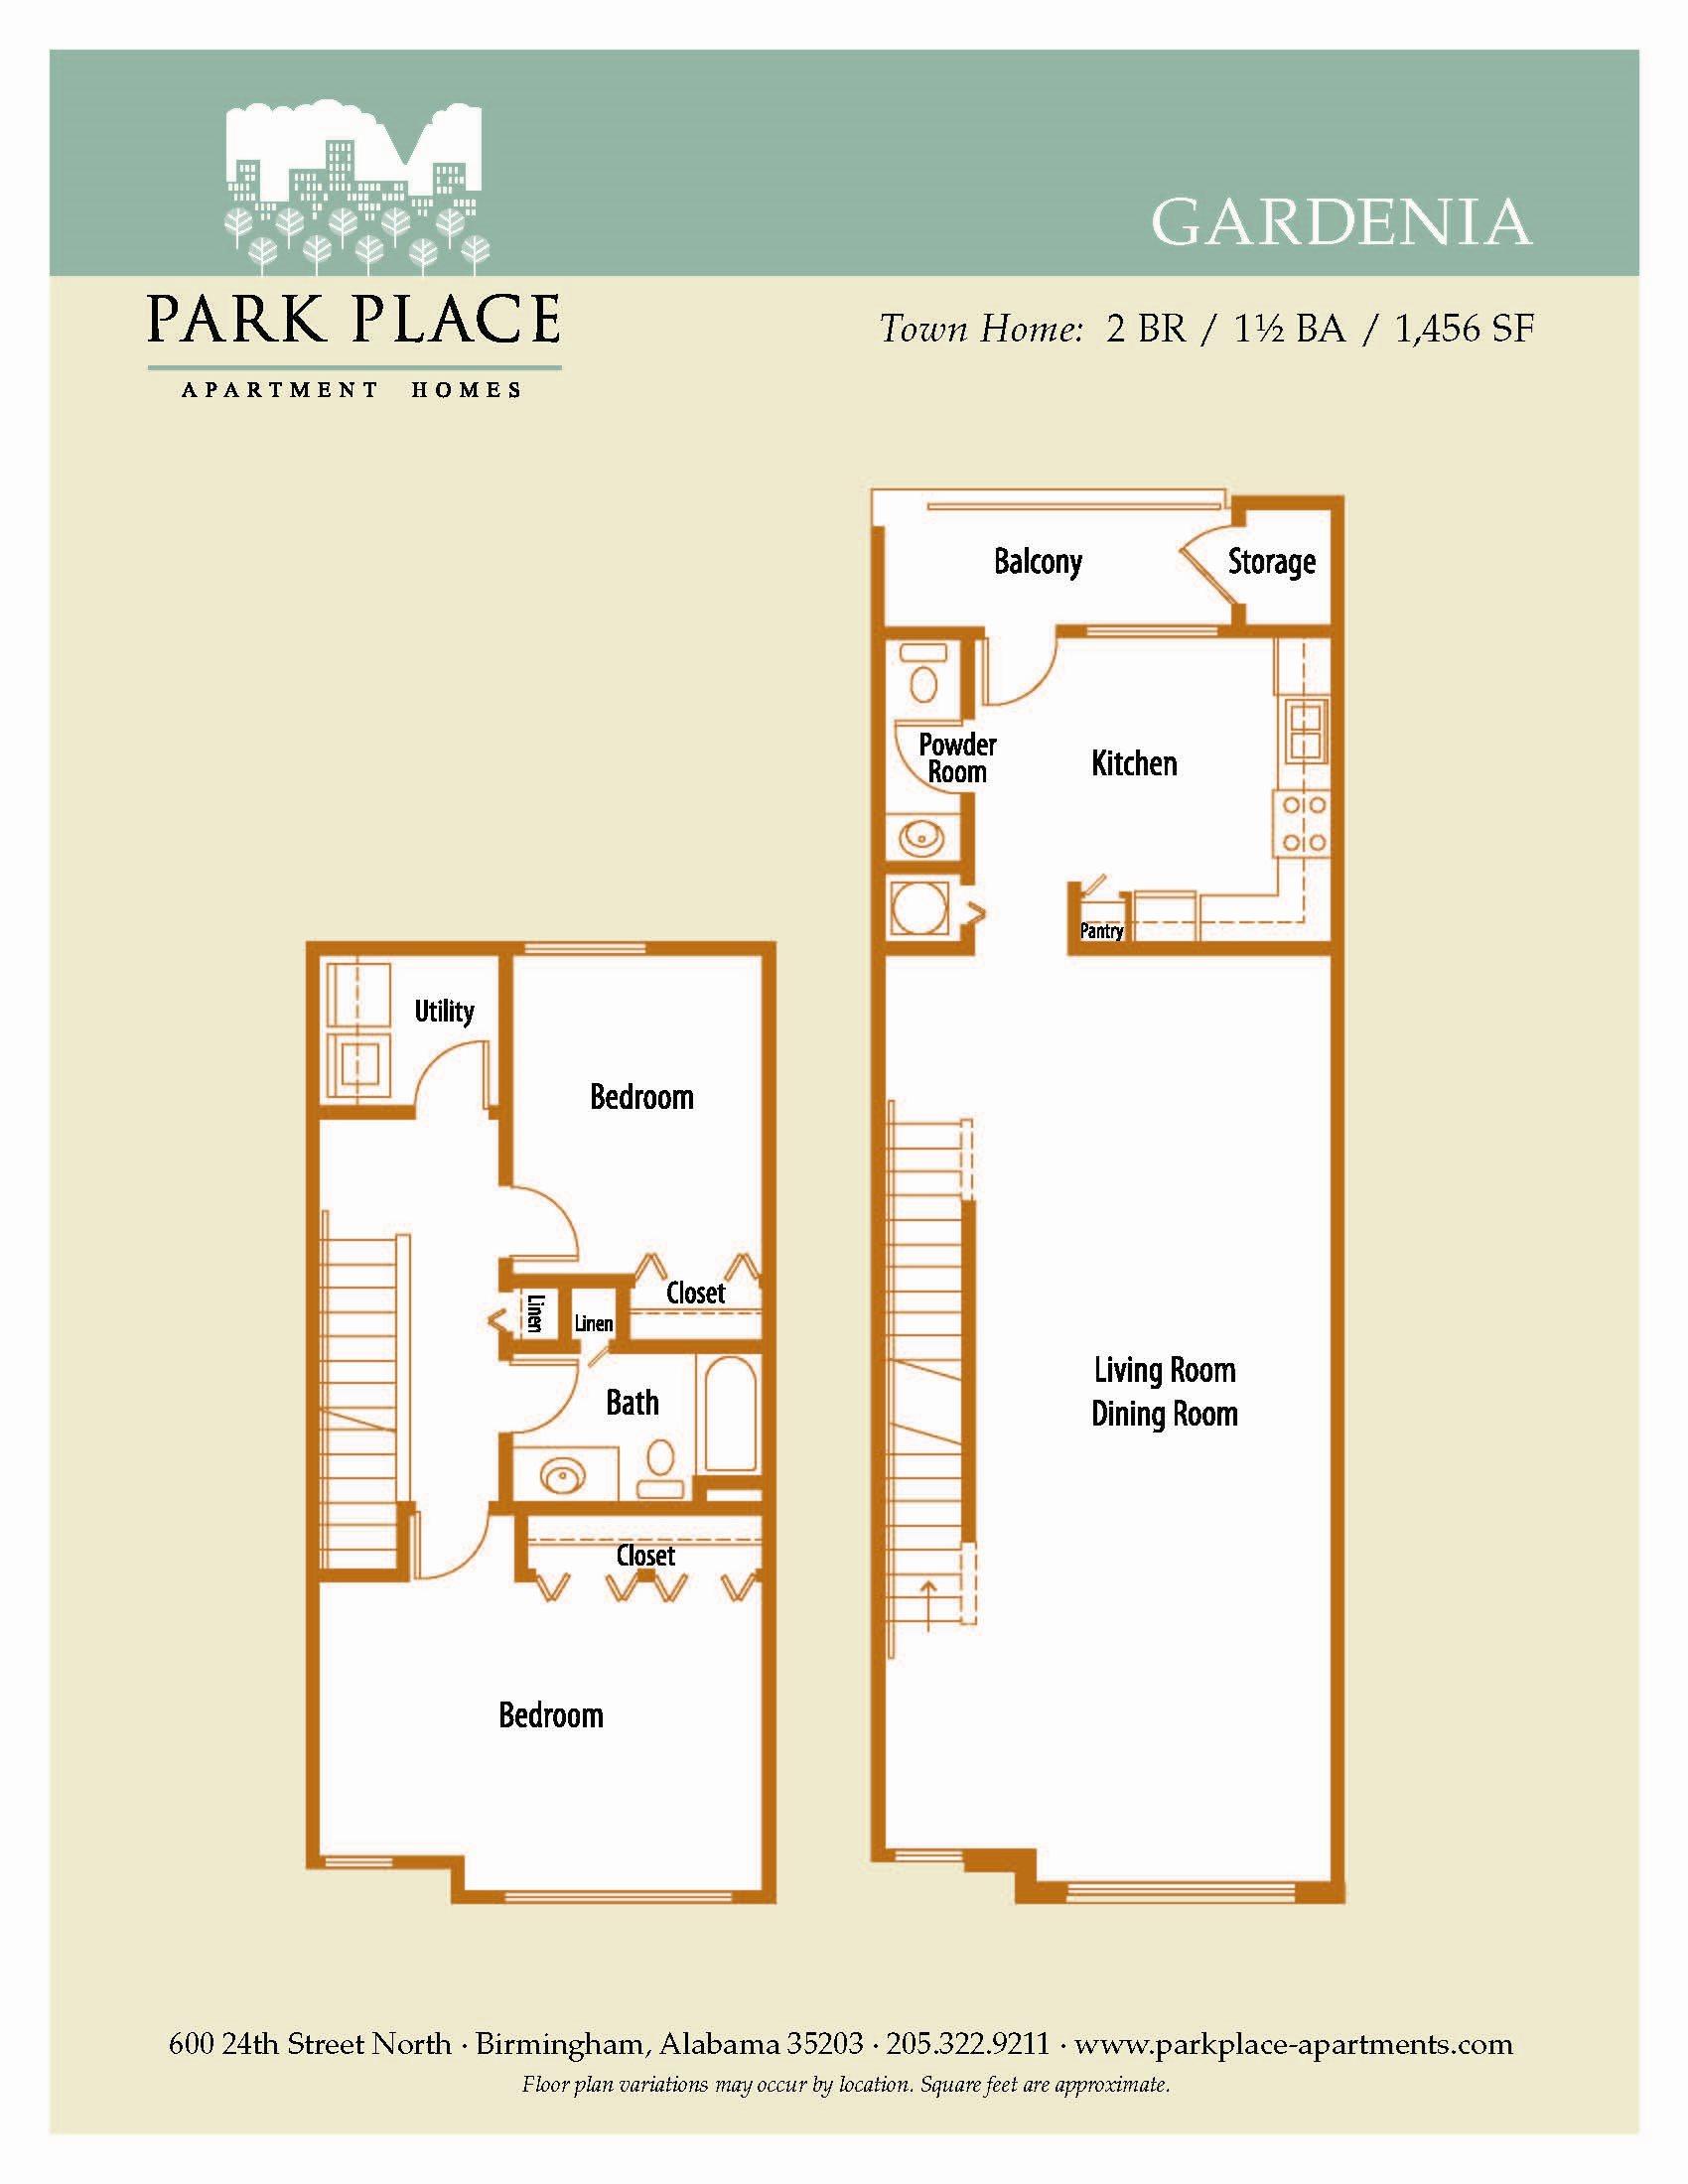 Gardenia Floor Plan 9